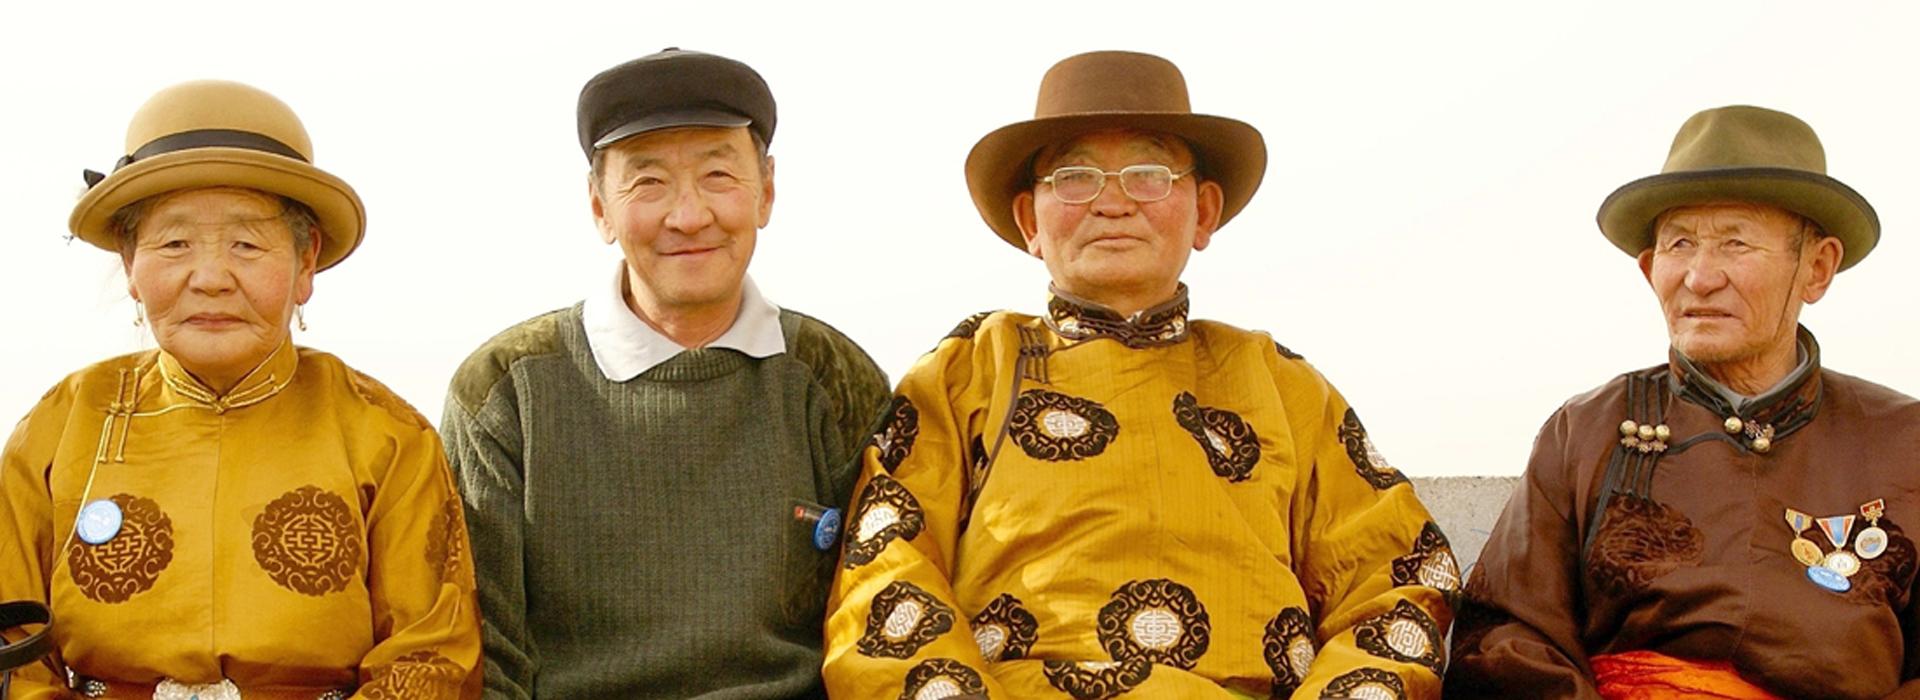 traditional_family_mongolia